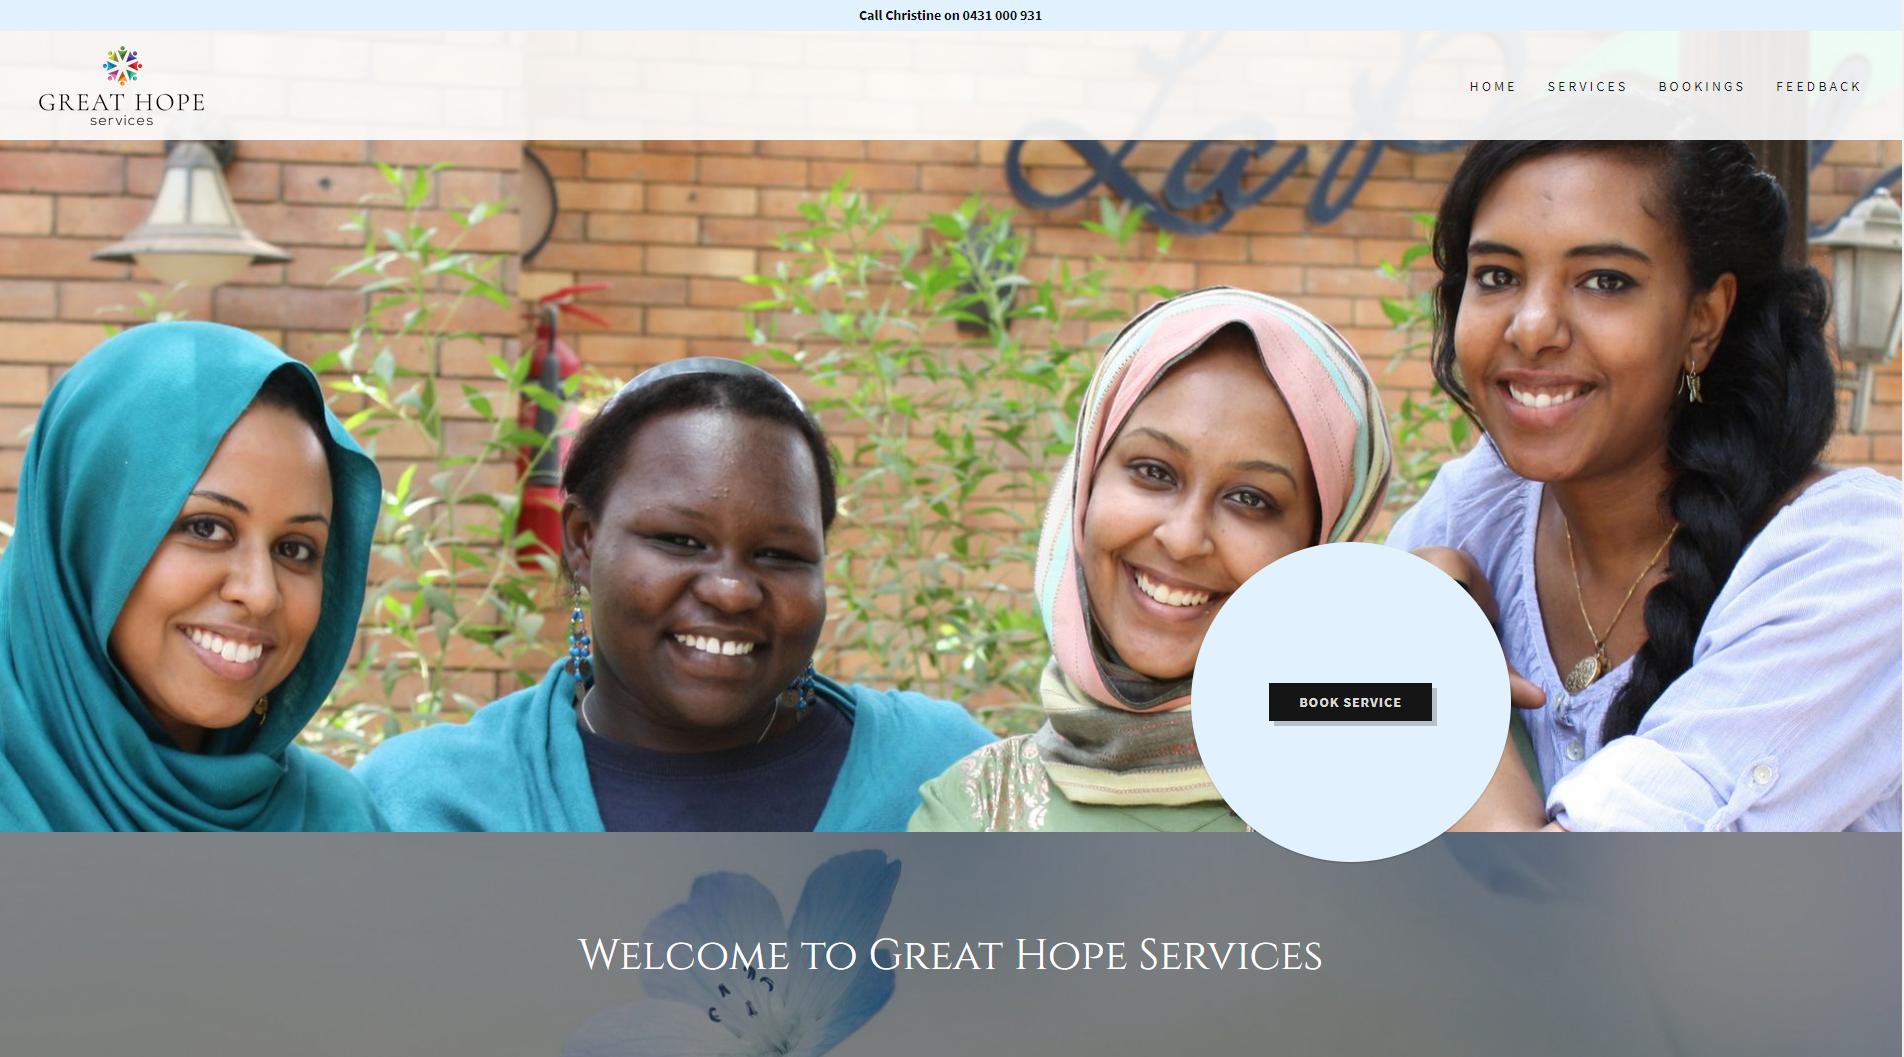 Website Design Great Hope Services